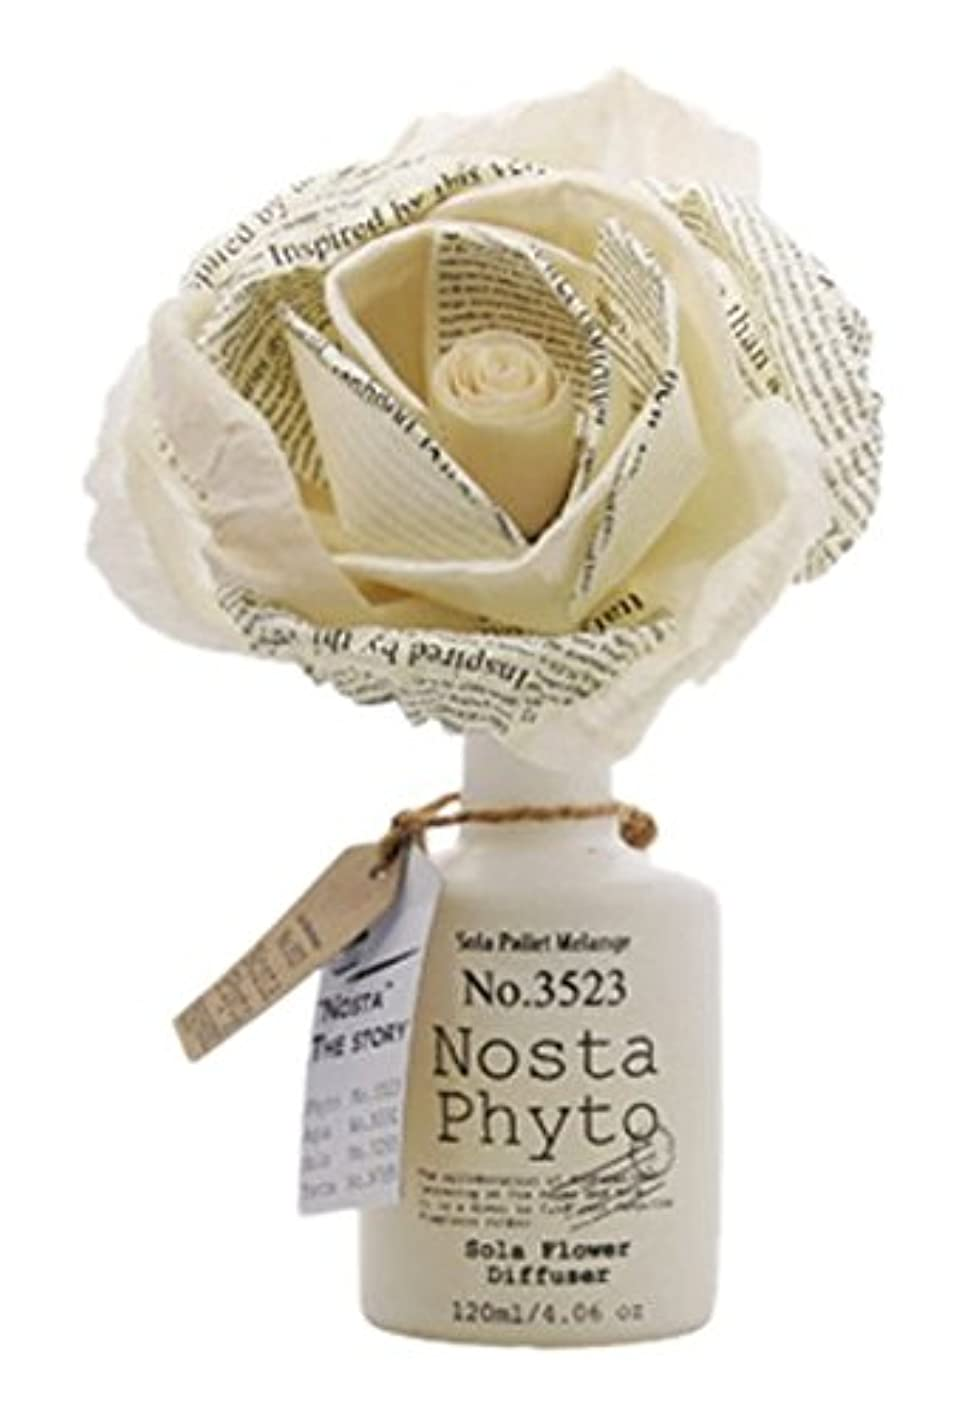 Nosta ノスタ Solaflower Diffuser ソラフラワーディフューザー phyto フィト / 植物